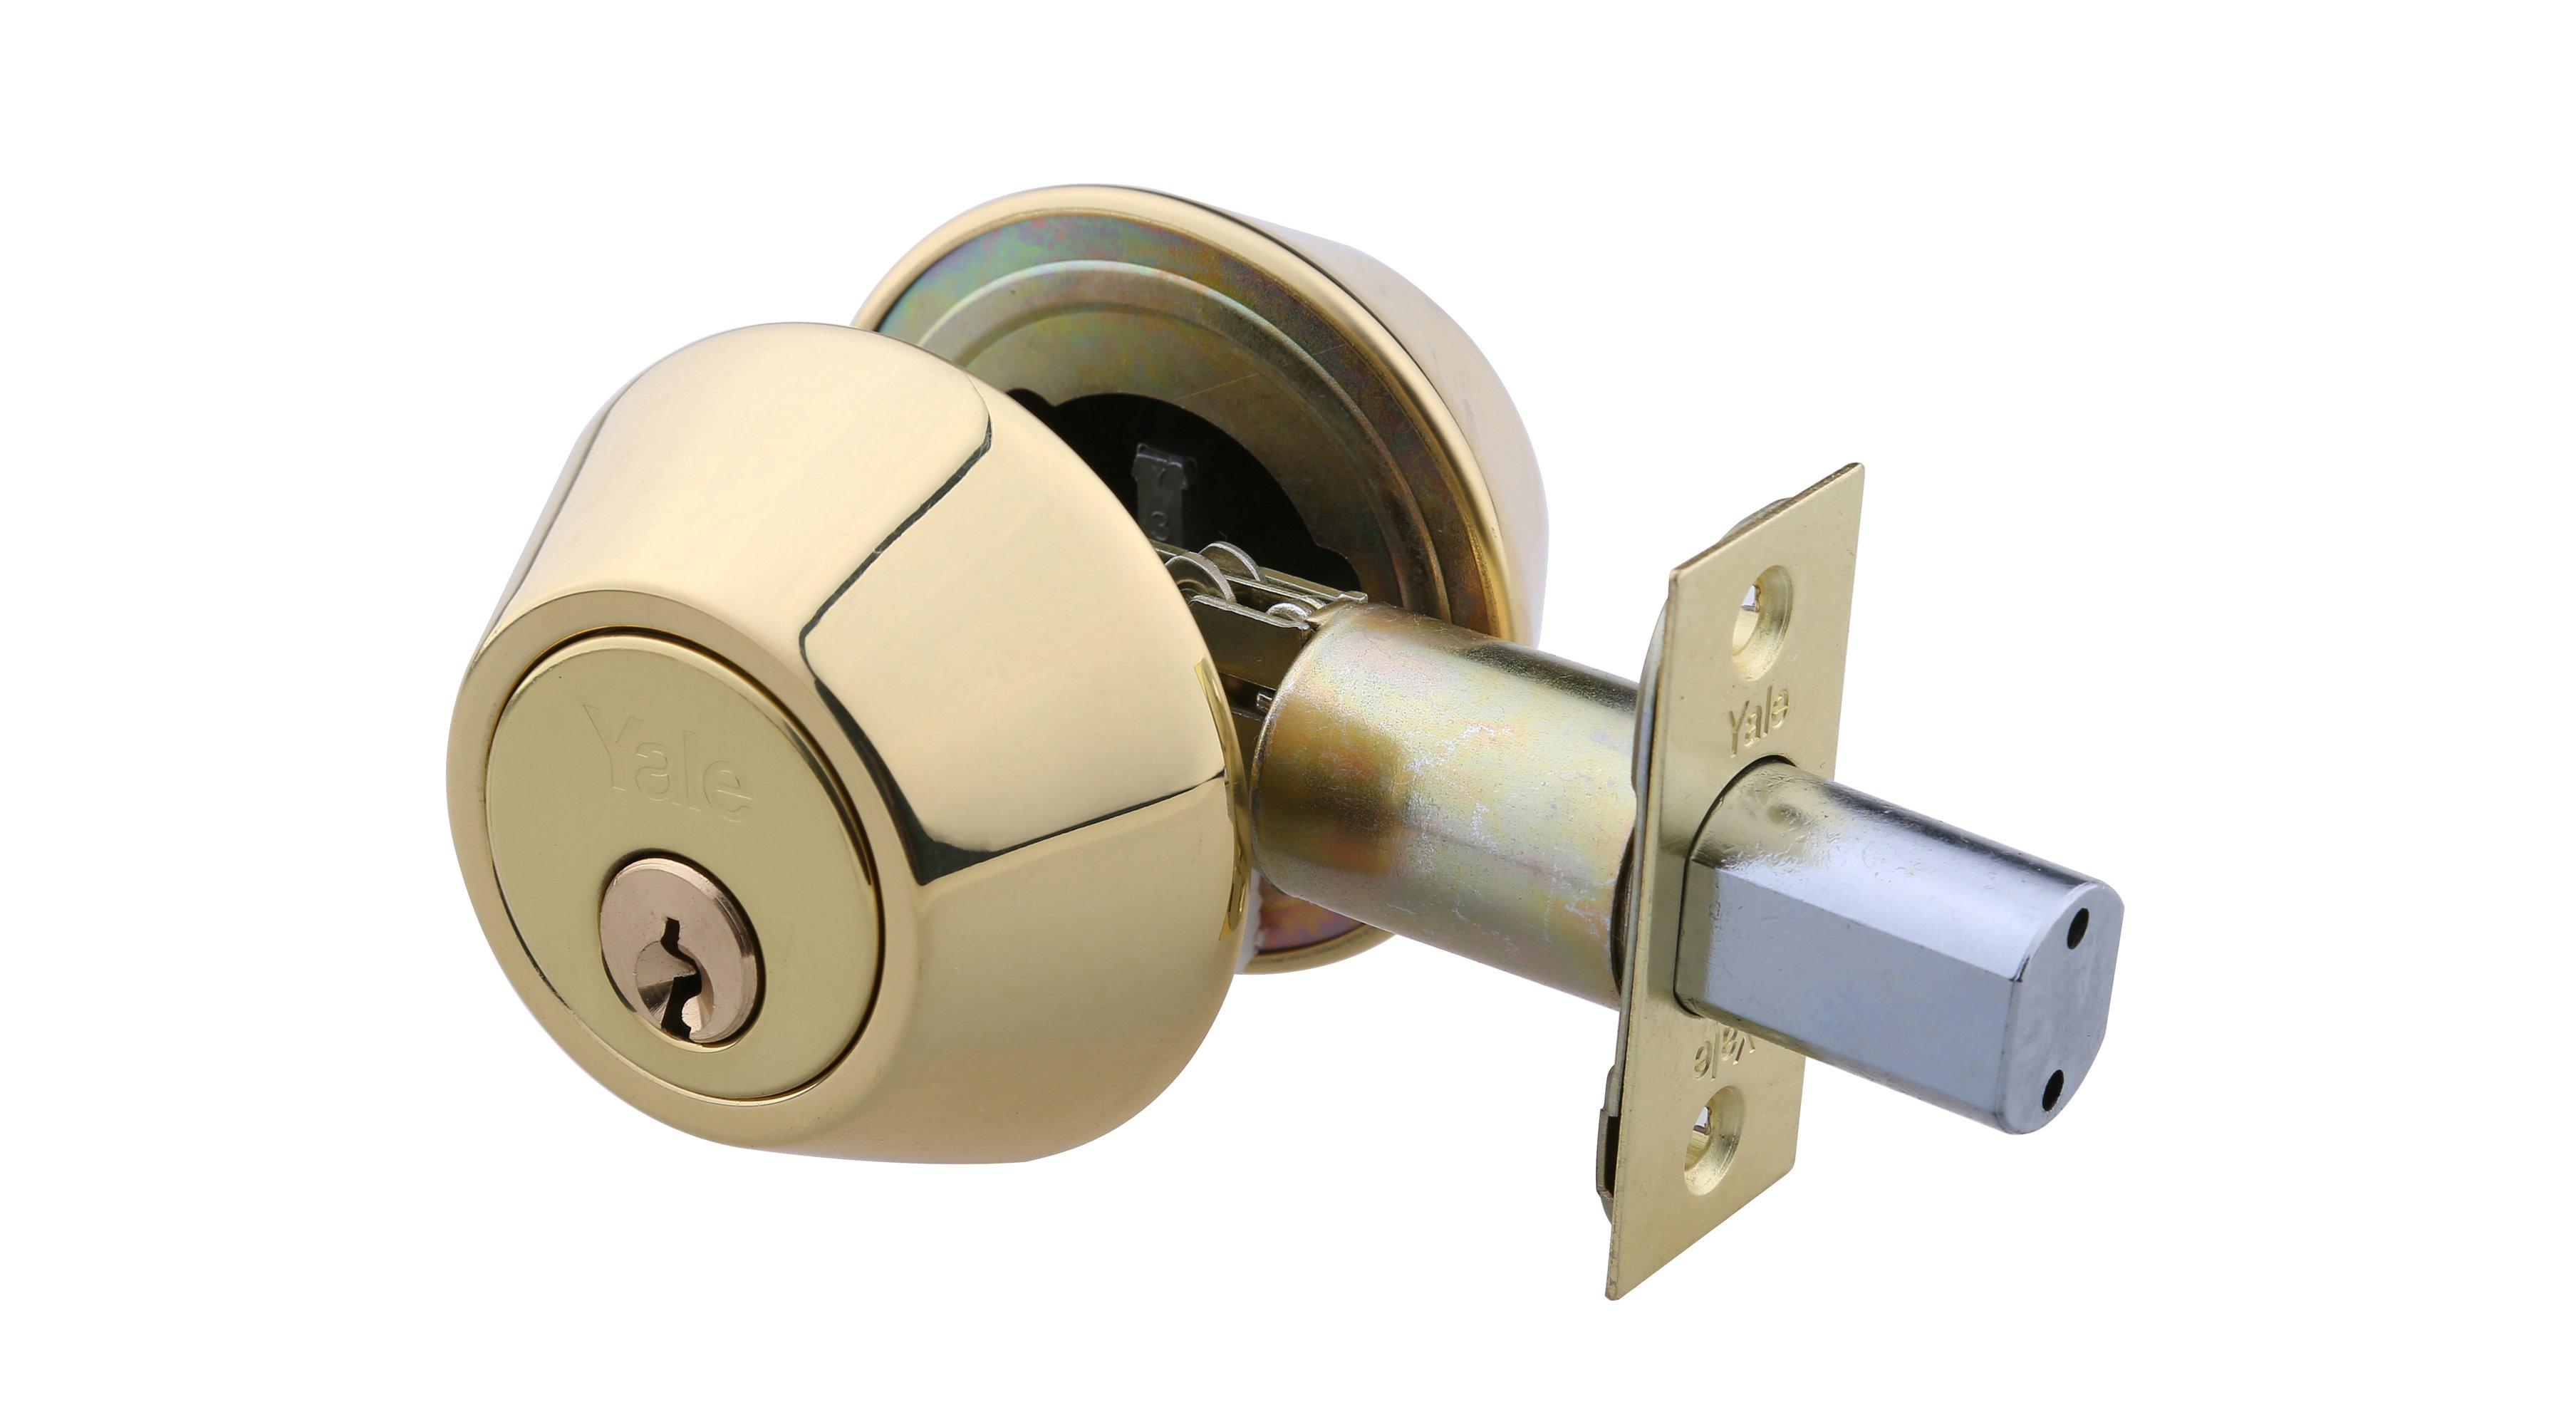 Double Cylinder Deadbolt - Polished Brass